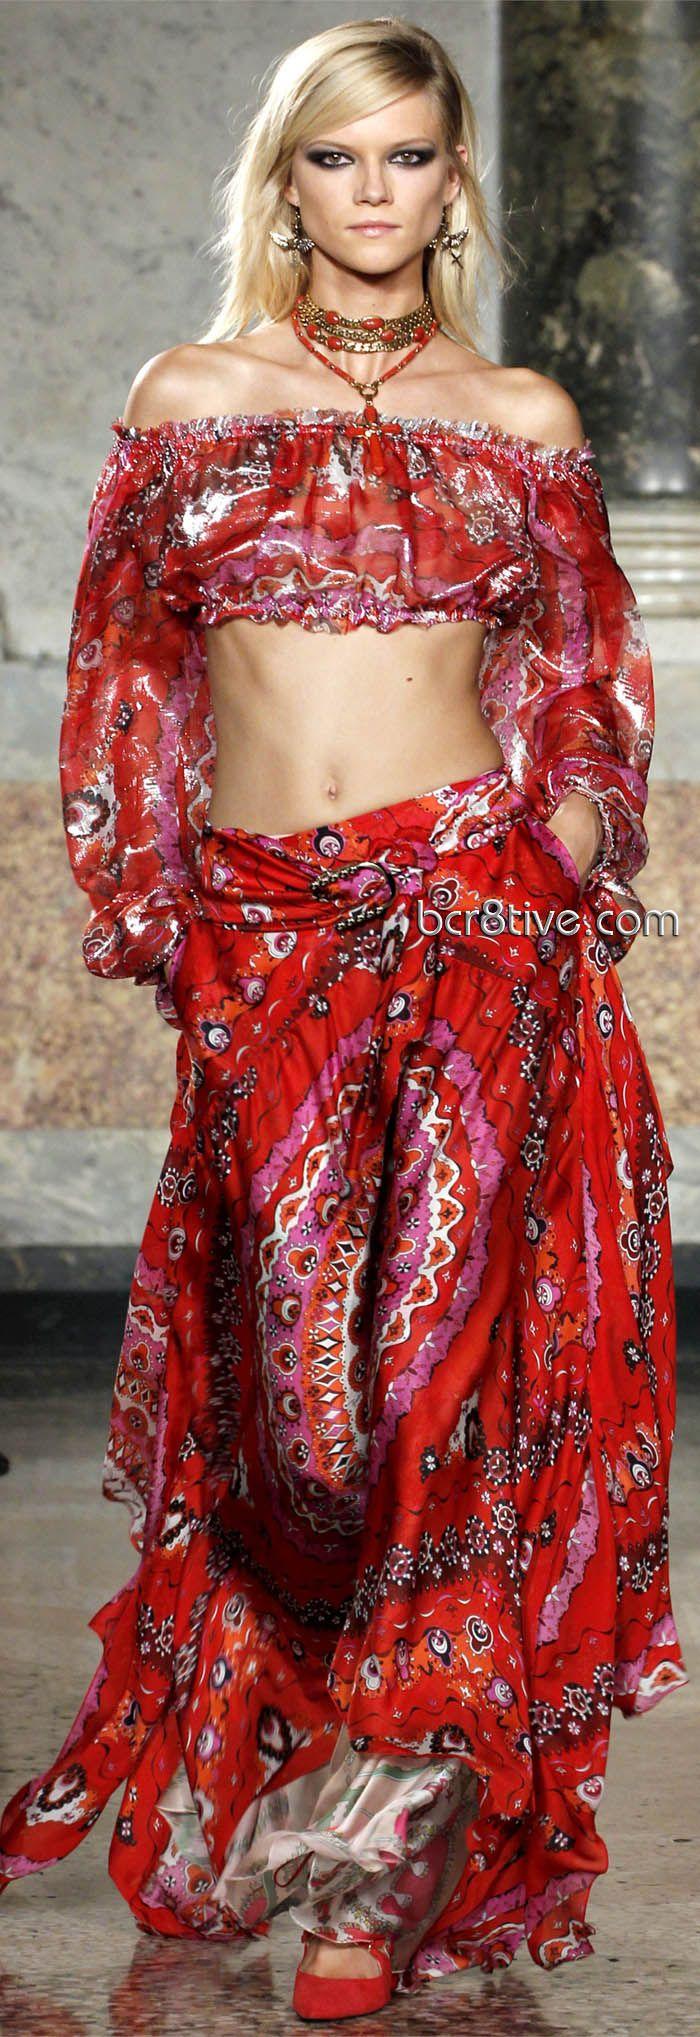 Emilio Pucci Spring Summer 2012 Ready to Wear